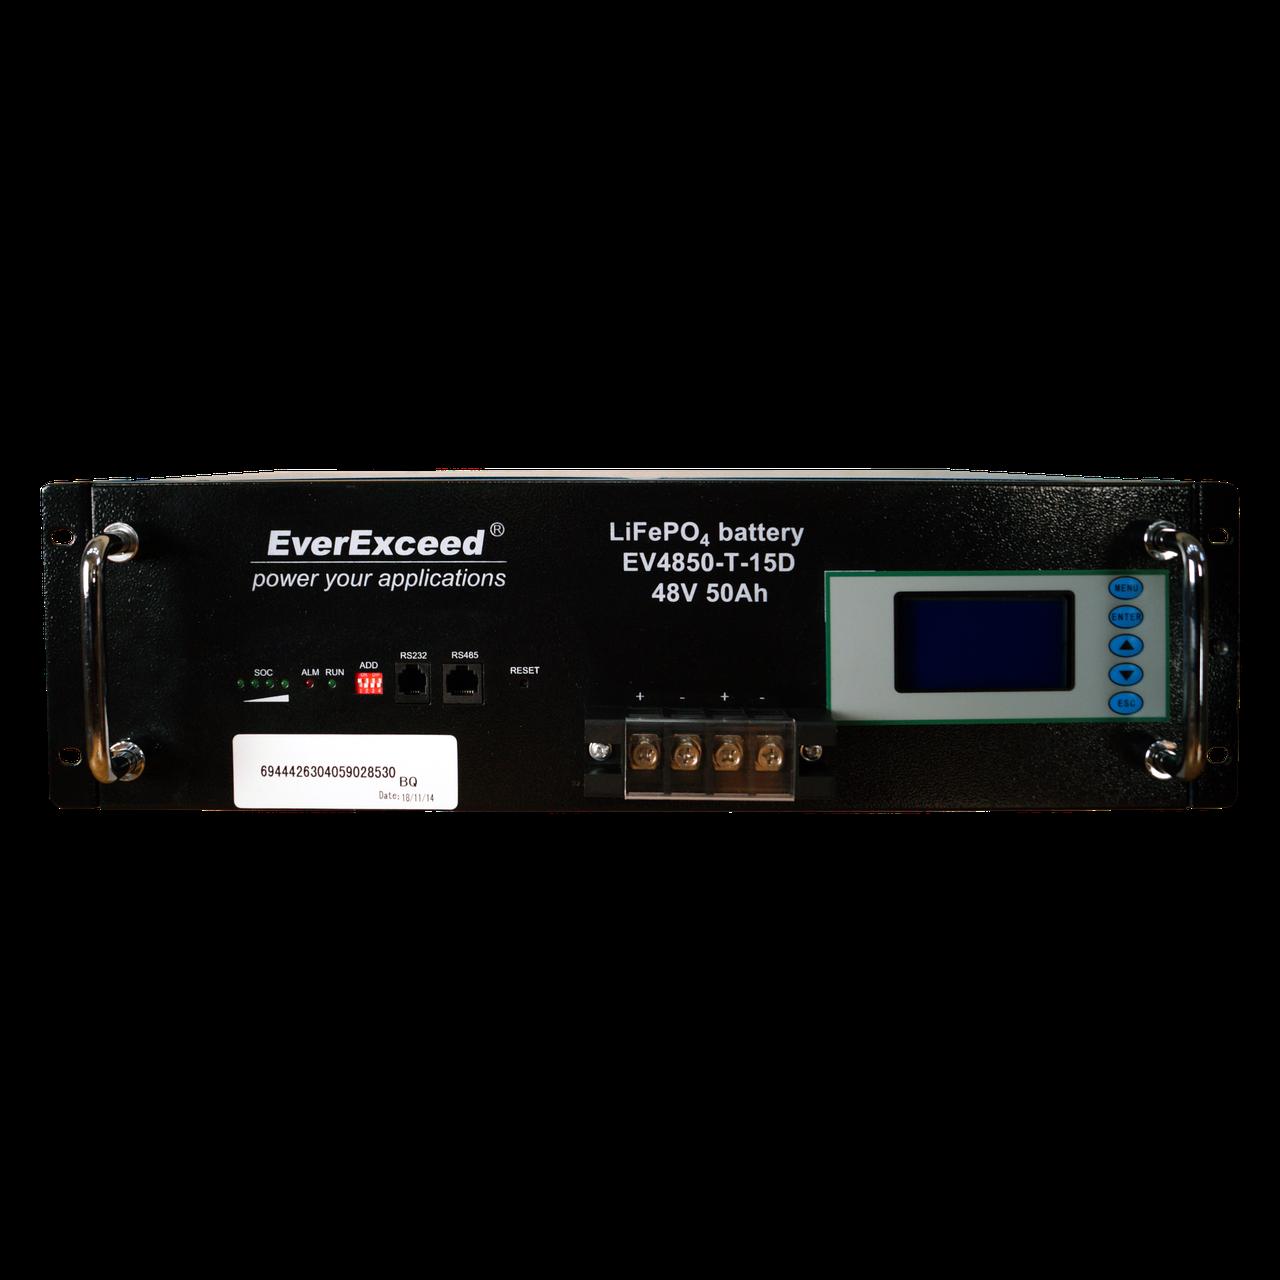 Аккумулятор литиевый EVEREXCEED EV4850-T-15D (48V/50Ah LCD)